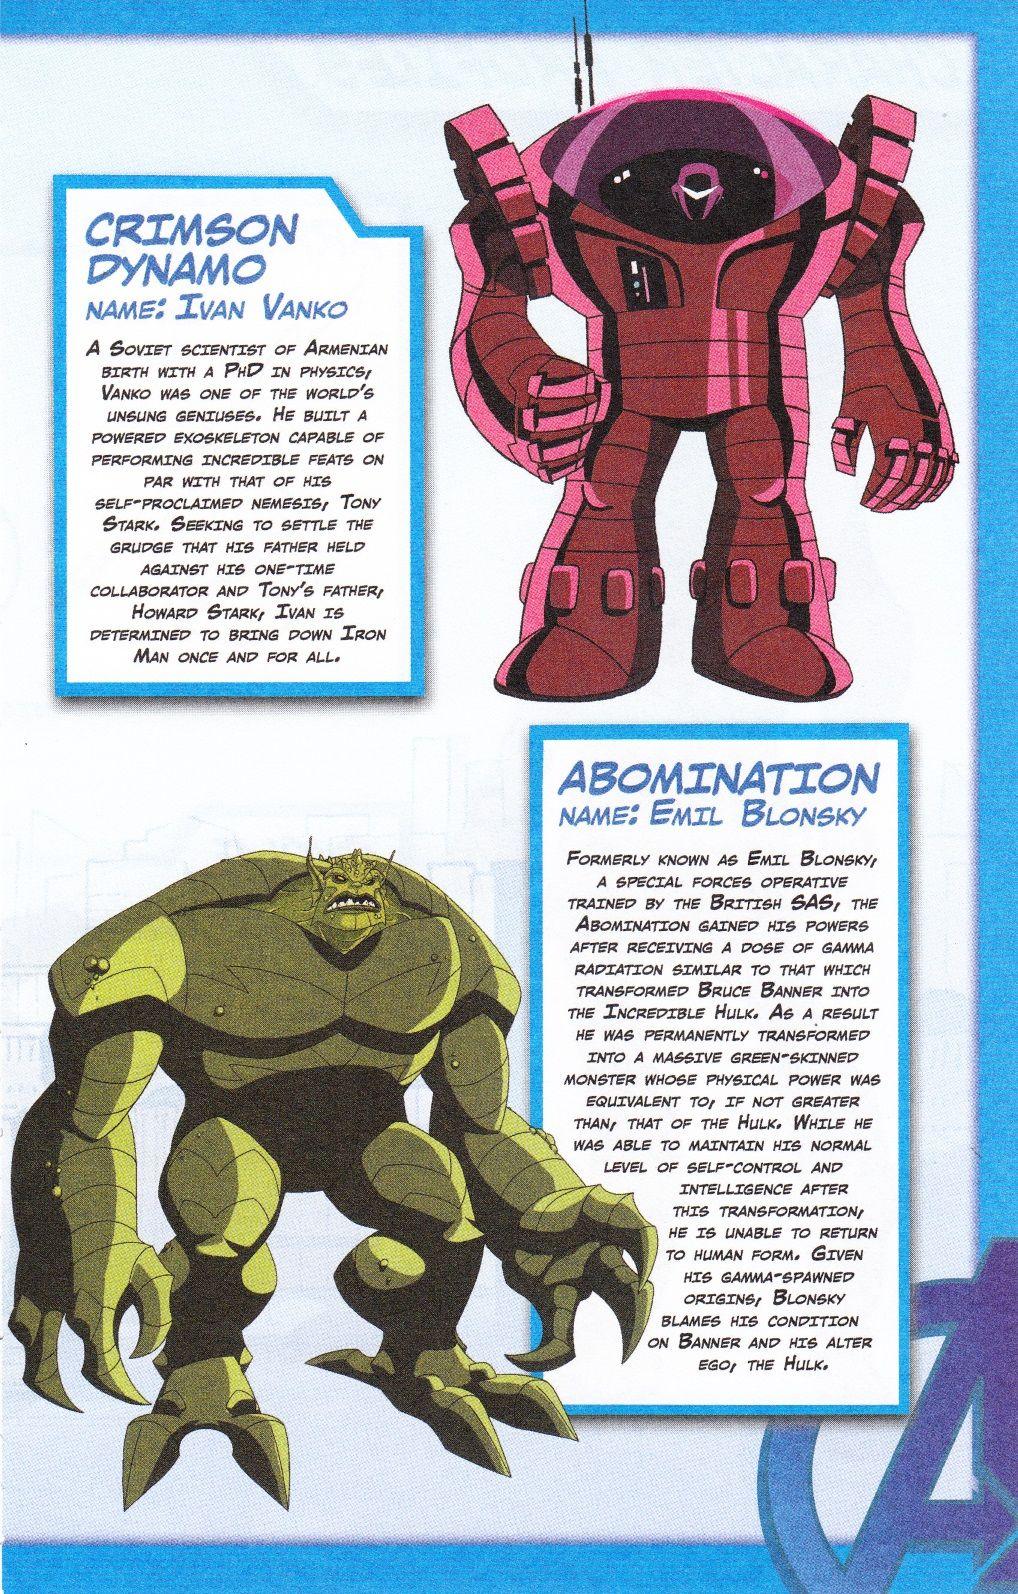 Crimson Dynamo Abomination Avengers Earth S Mightiest Heroes